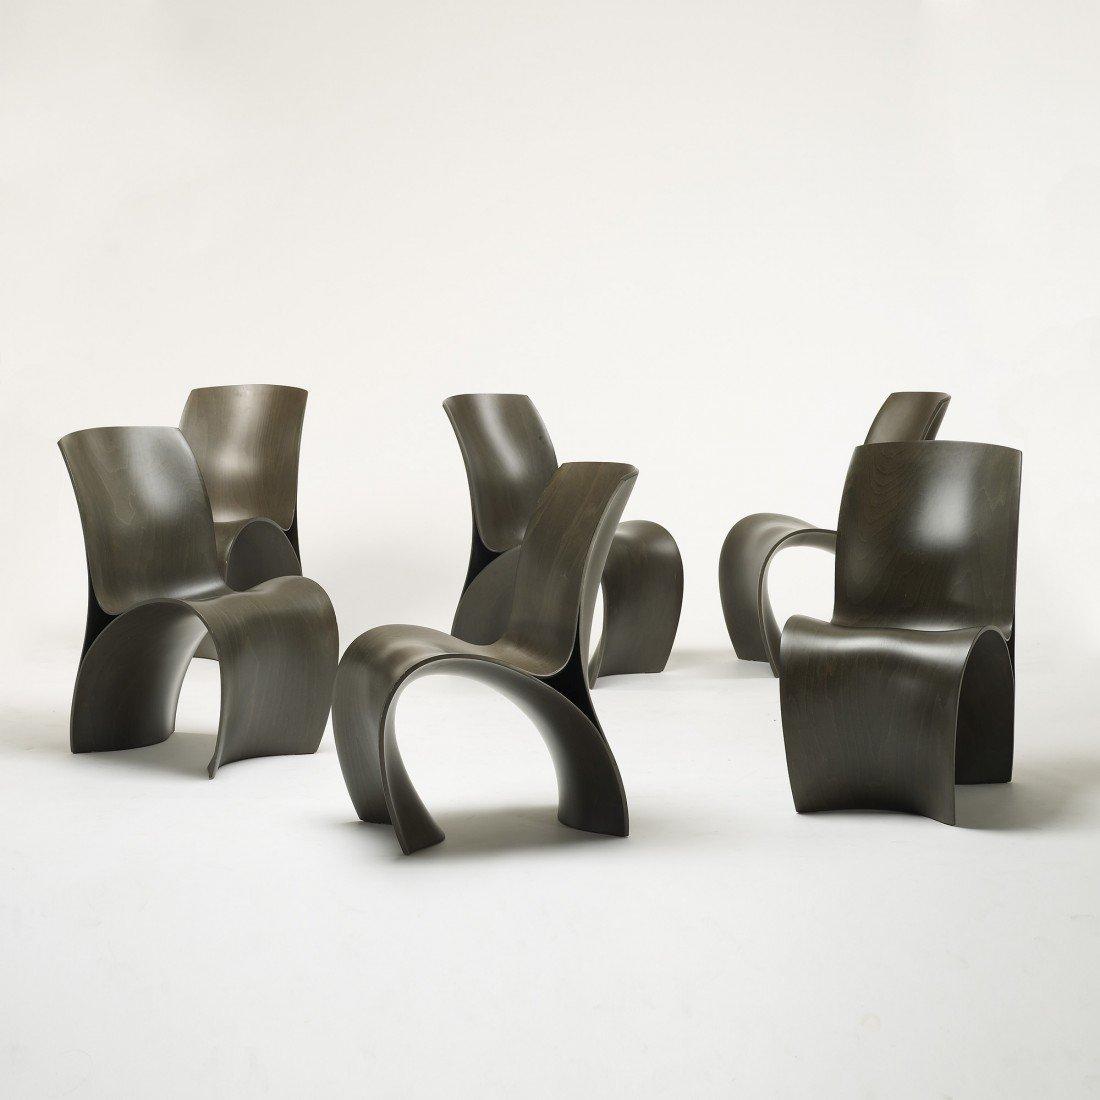 124: Ron Arad Three Skin chairs, set of six